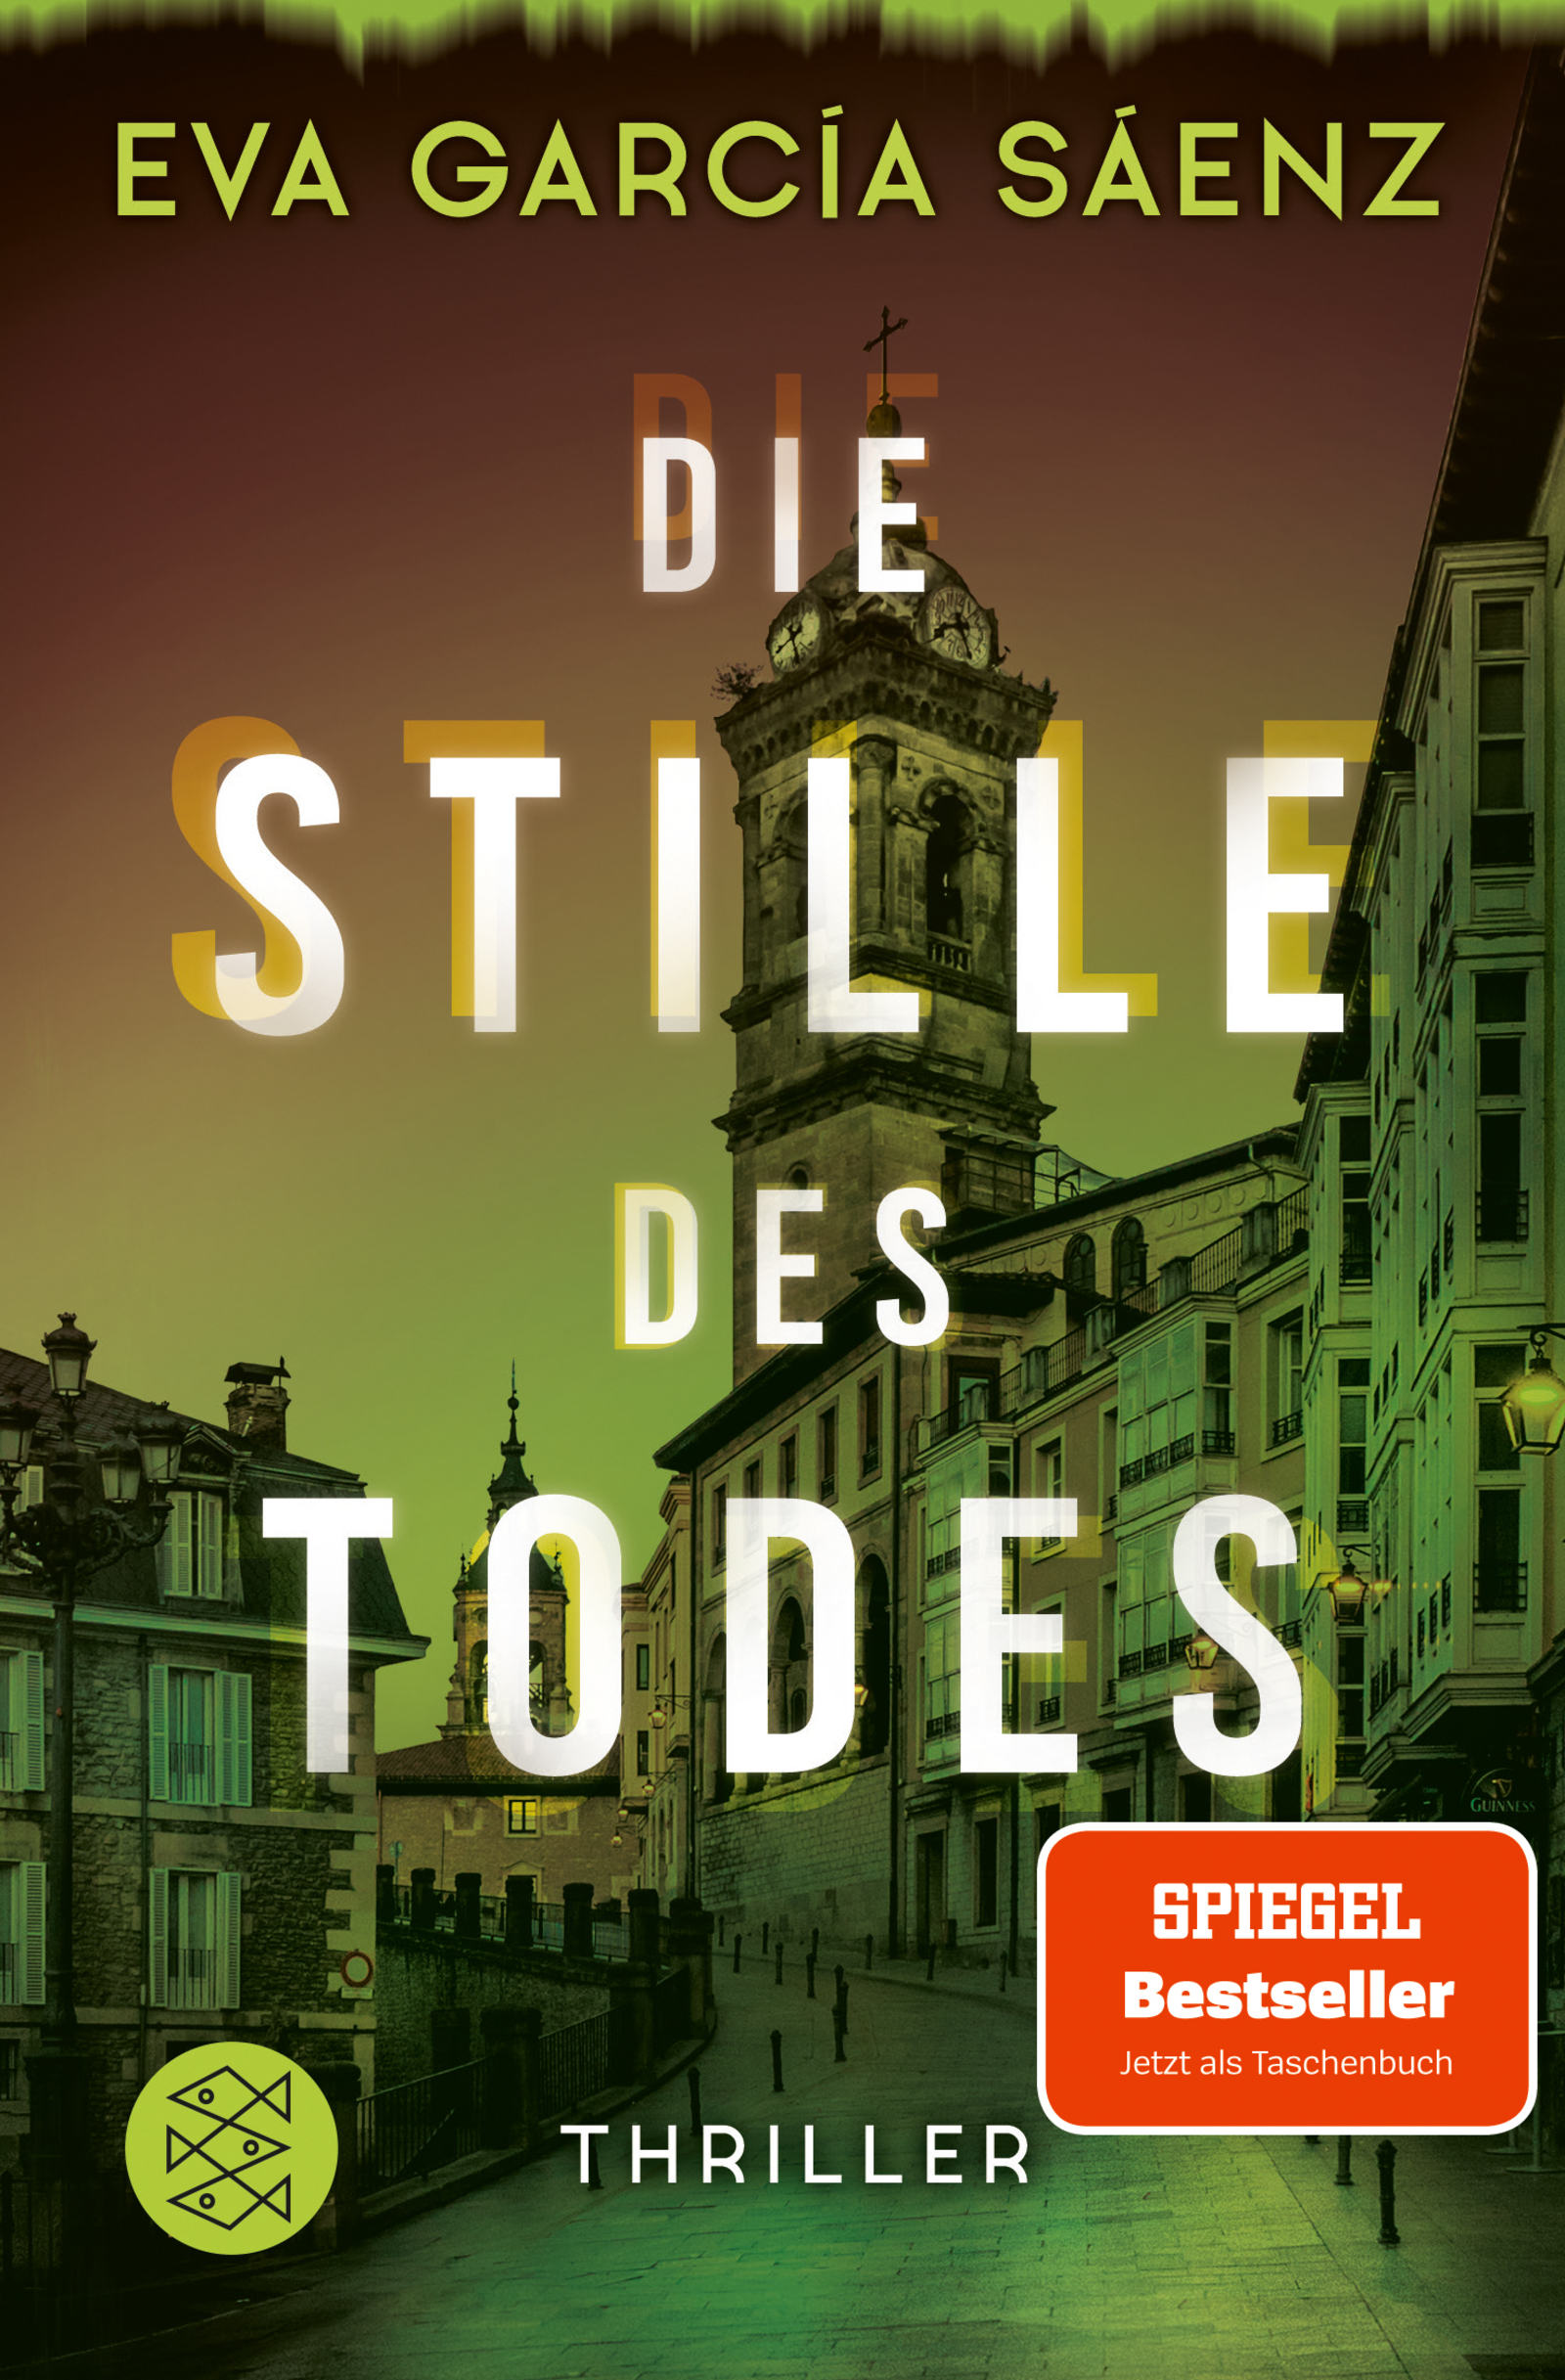 596-70123-0_Saenz_Stille_des_Todes_JW_FIN_U1.indd